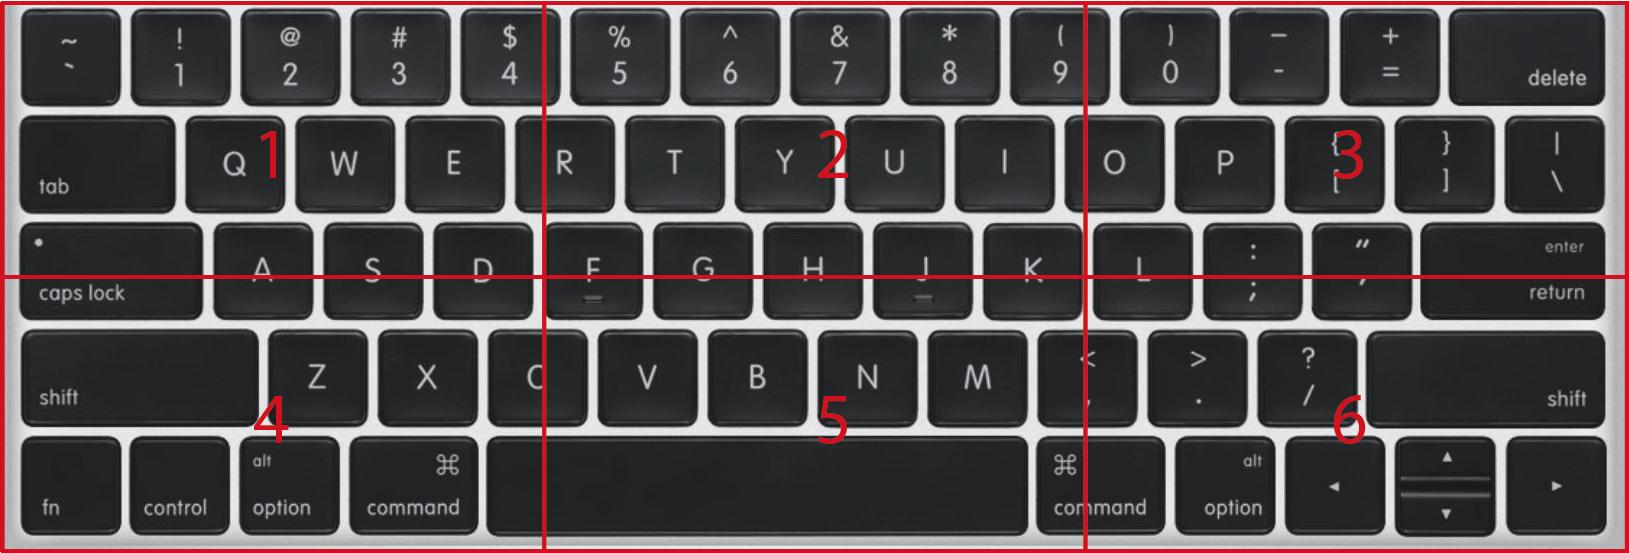 mbp-keyboard.png